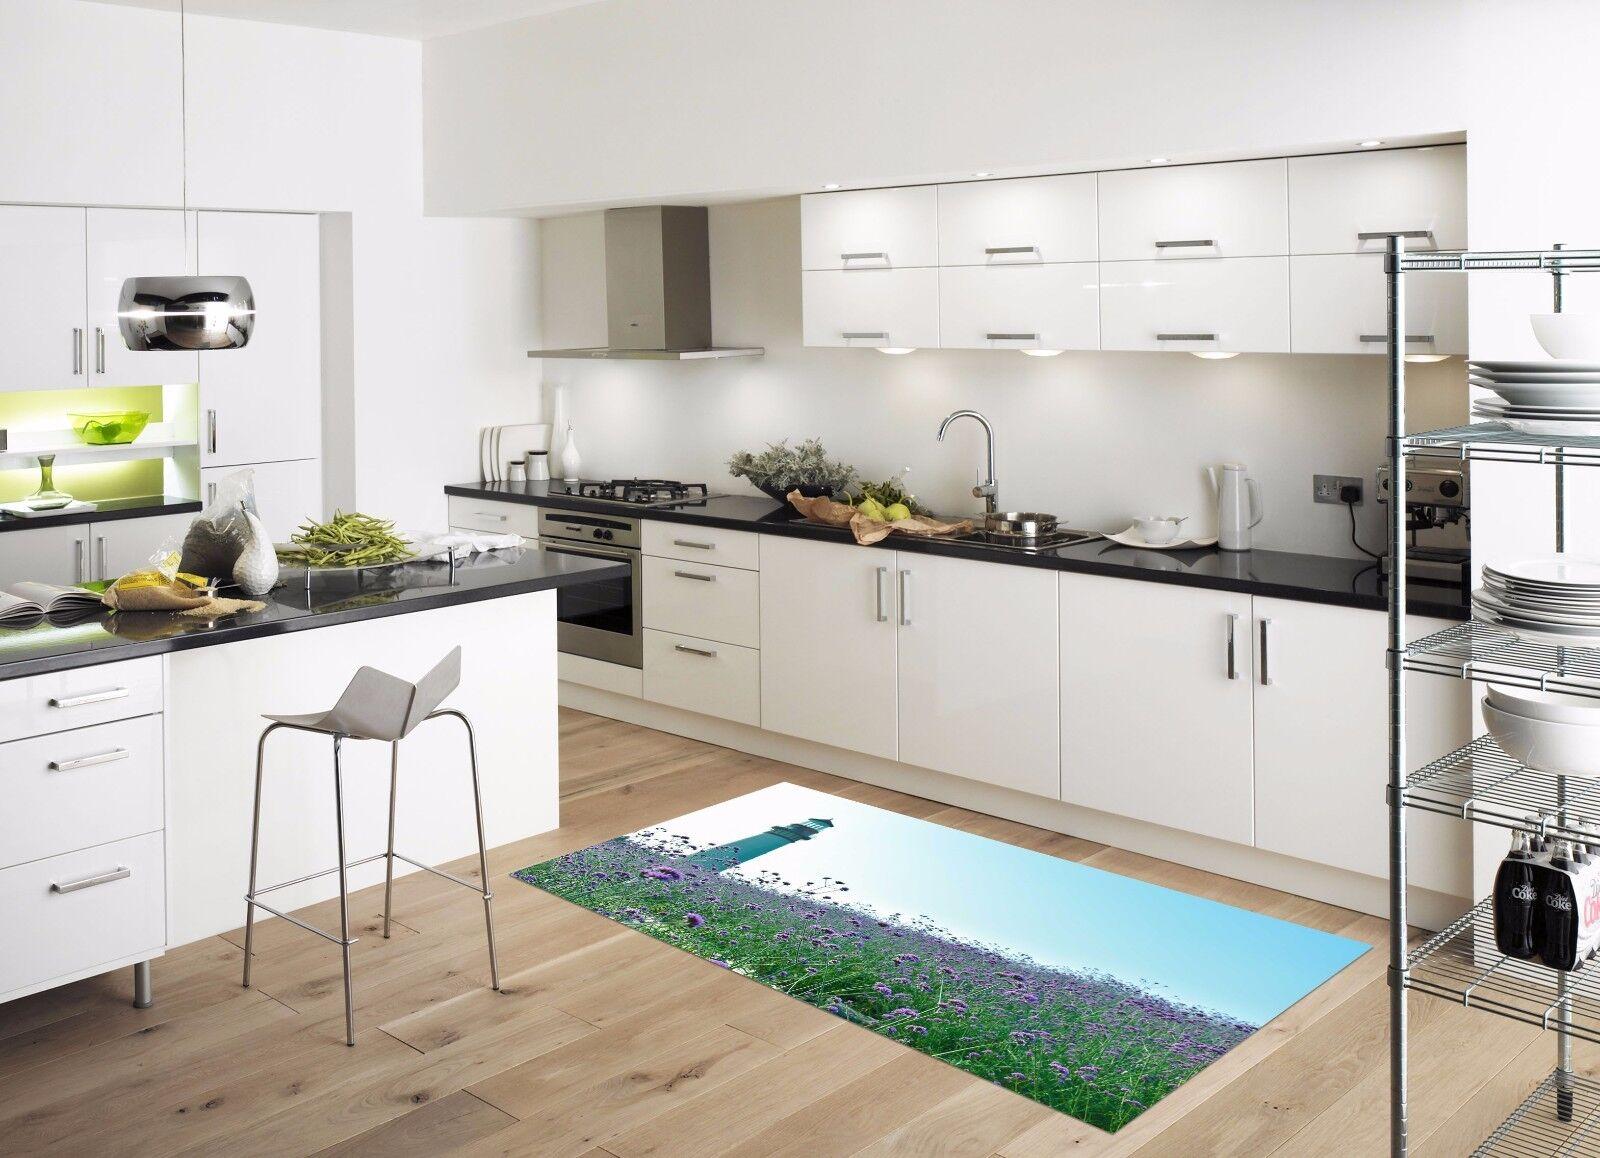 3D Fiori cucina di Cielo 733 Tappetino da cucina Fiori pavimento ...